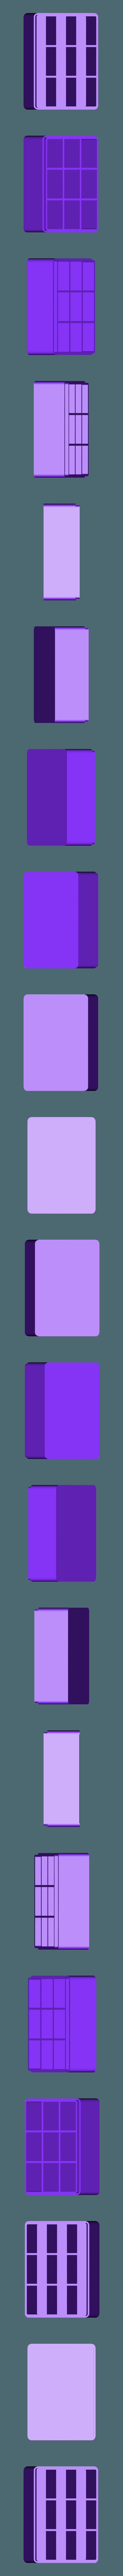 Boite-50x35x20-Separ-Dessous.stl Download STL file Storage box for model making 50 x 35 x 20 mm with dividers • 3D printable design, Almisuifre